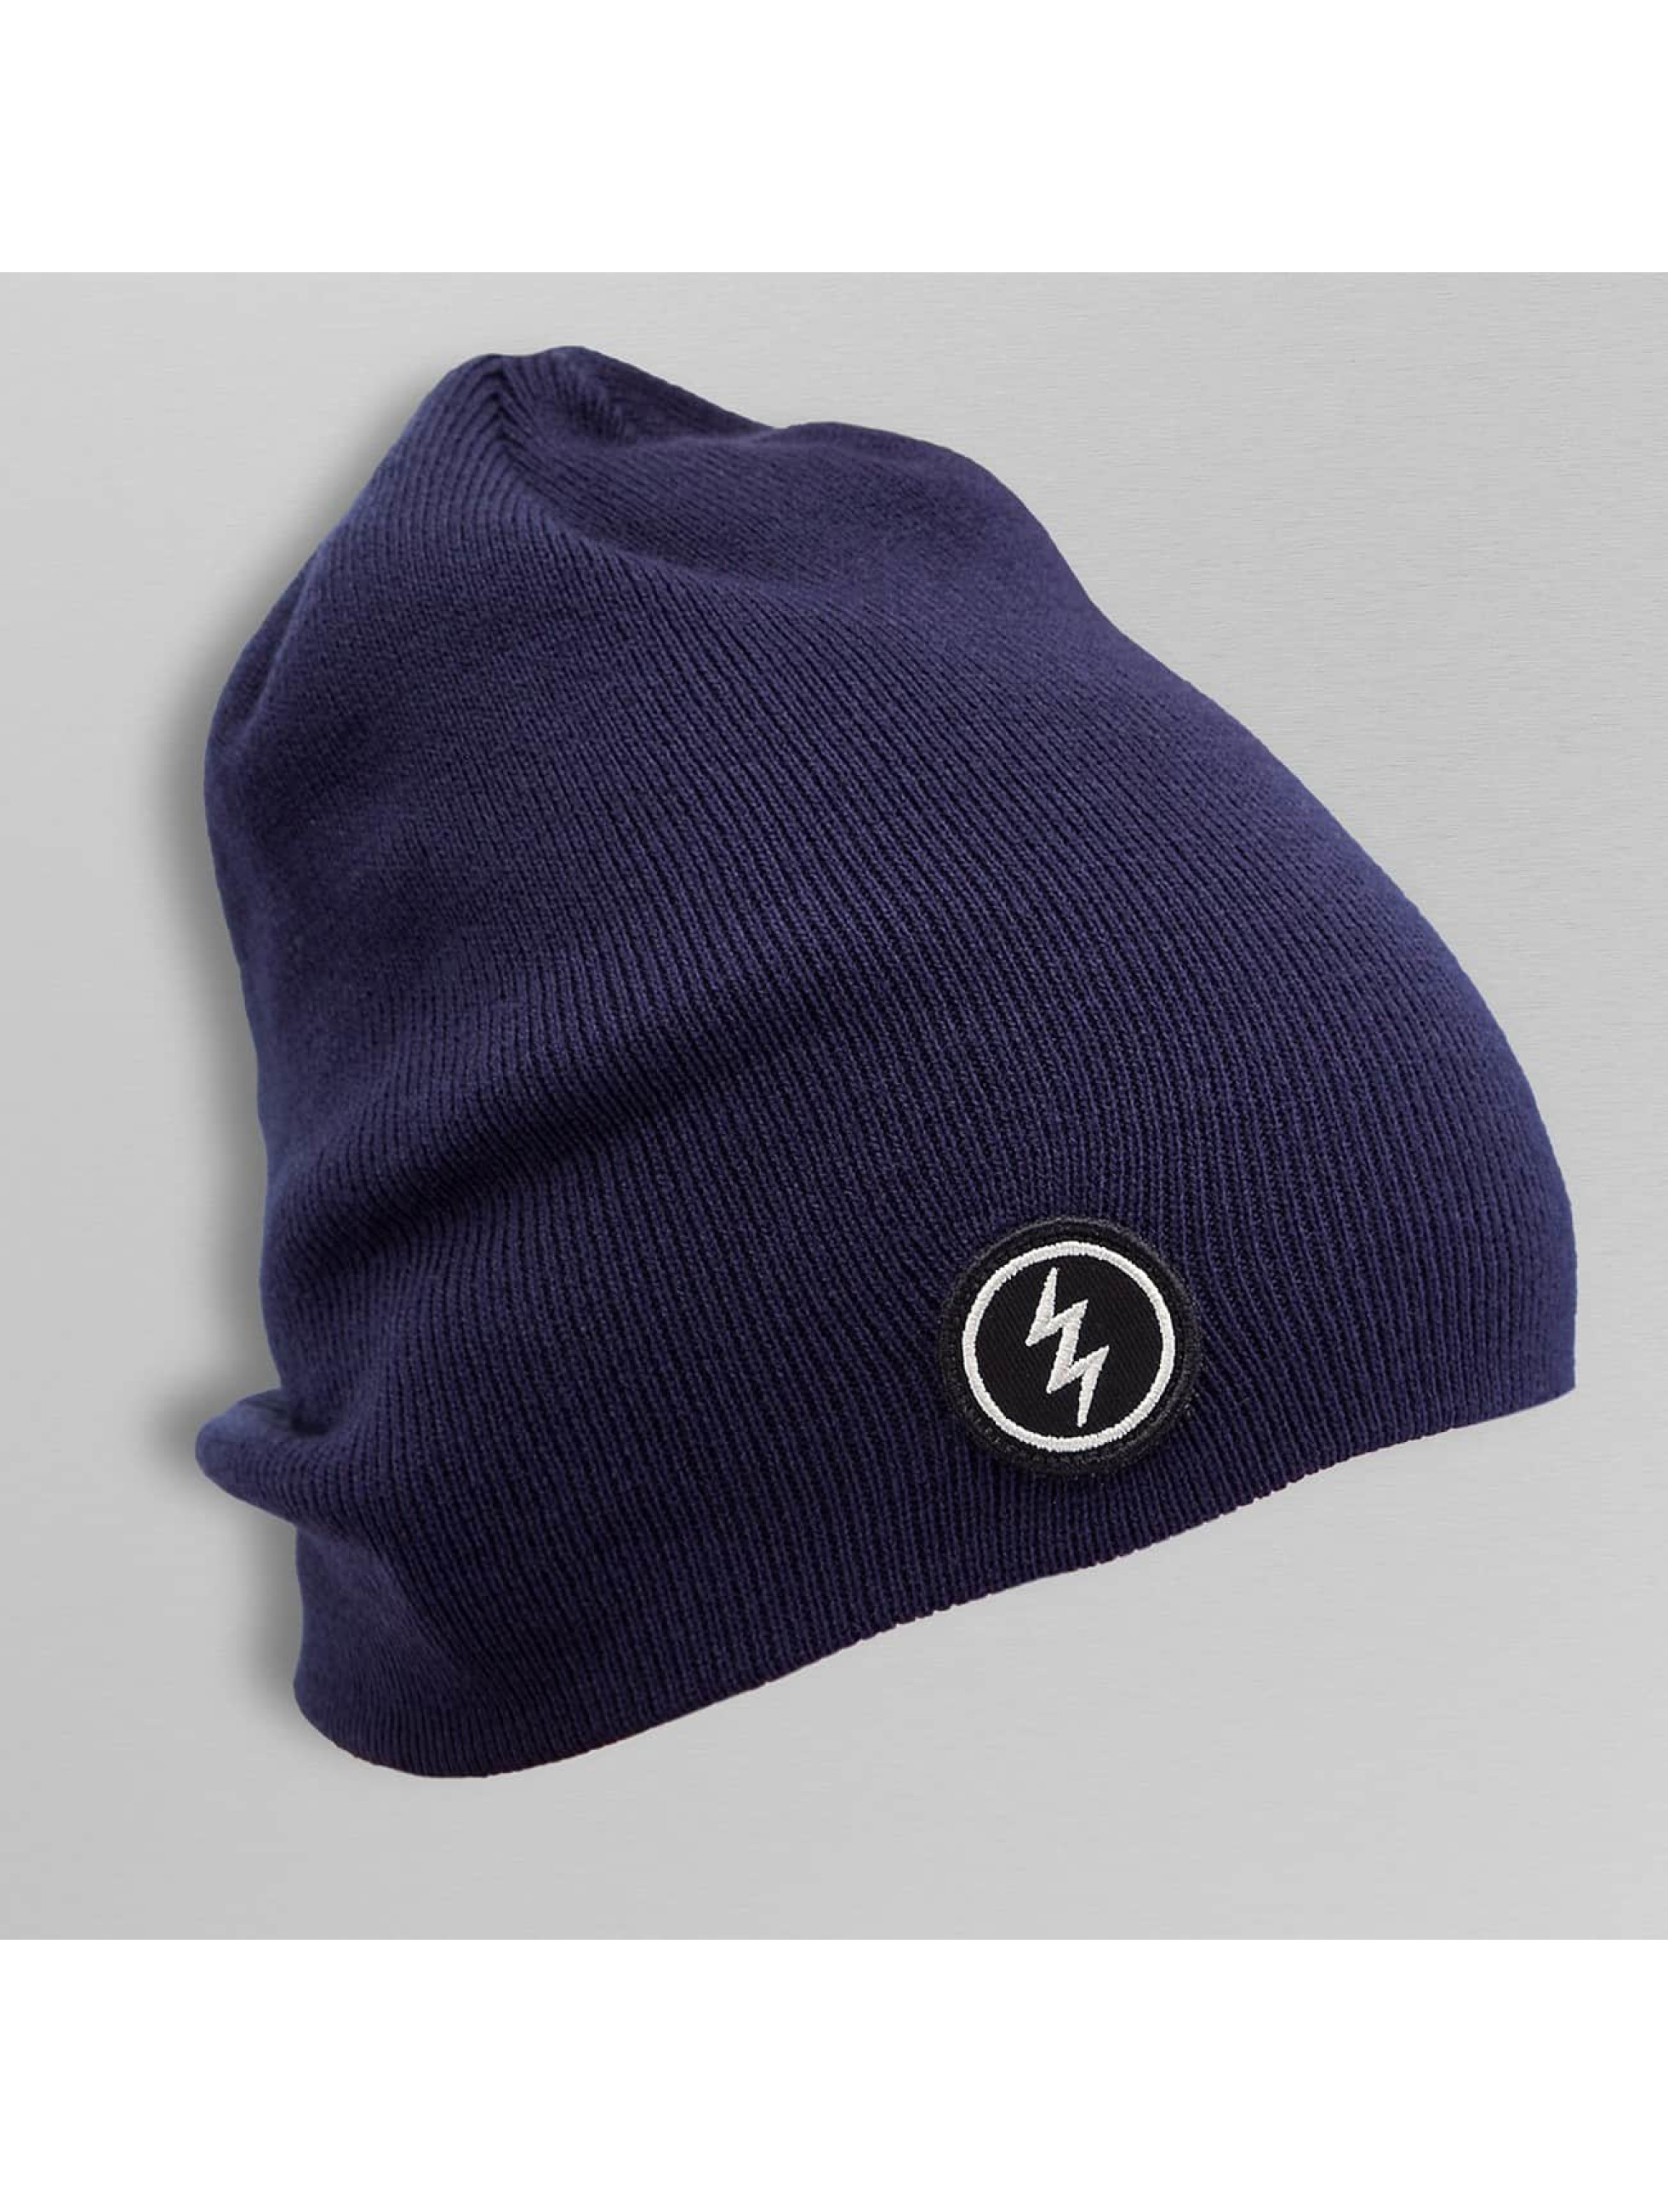 Electric Hat-1 CO. blue